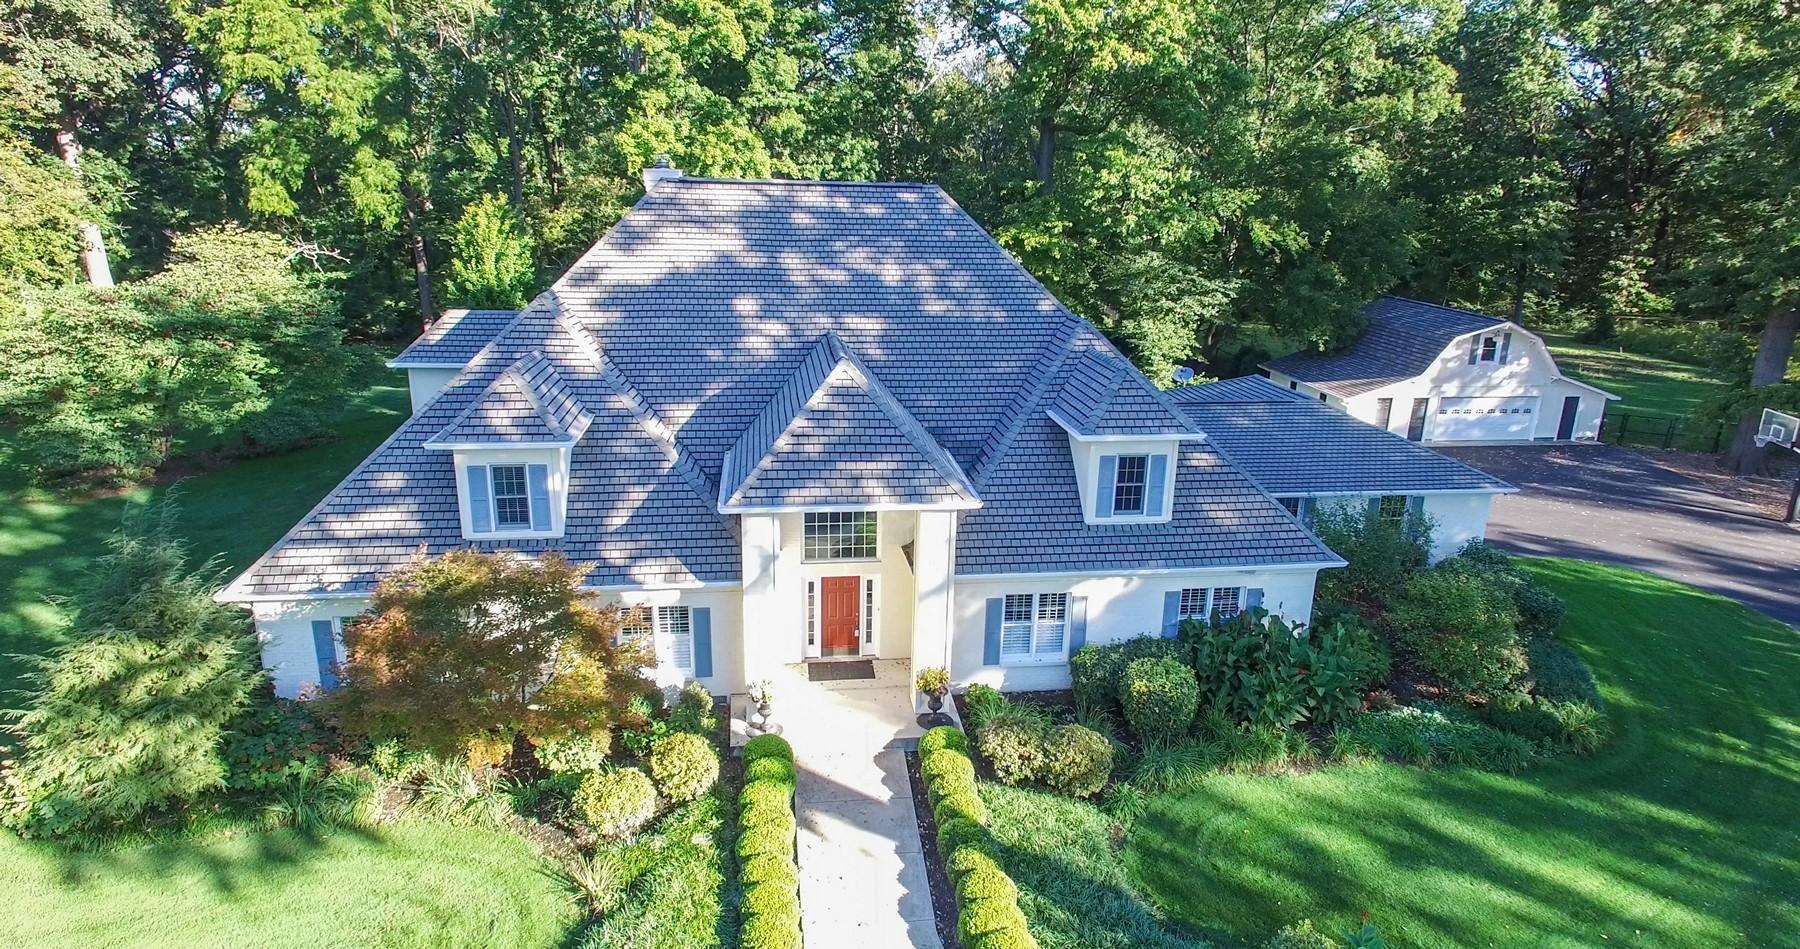 独户住宅 为 销售 在 2.7 Scenic Acres & Home 3548 W. 126th Street 卡梅尔, 印第安纳州, 46032 美国